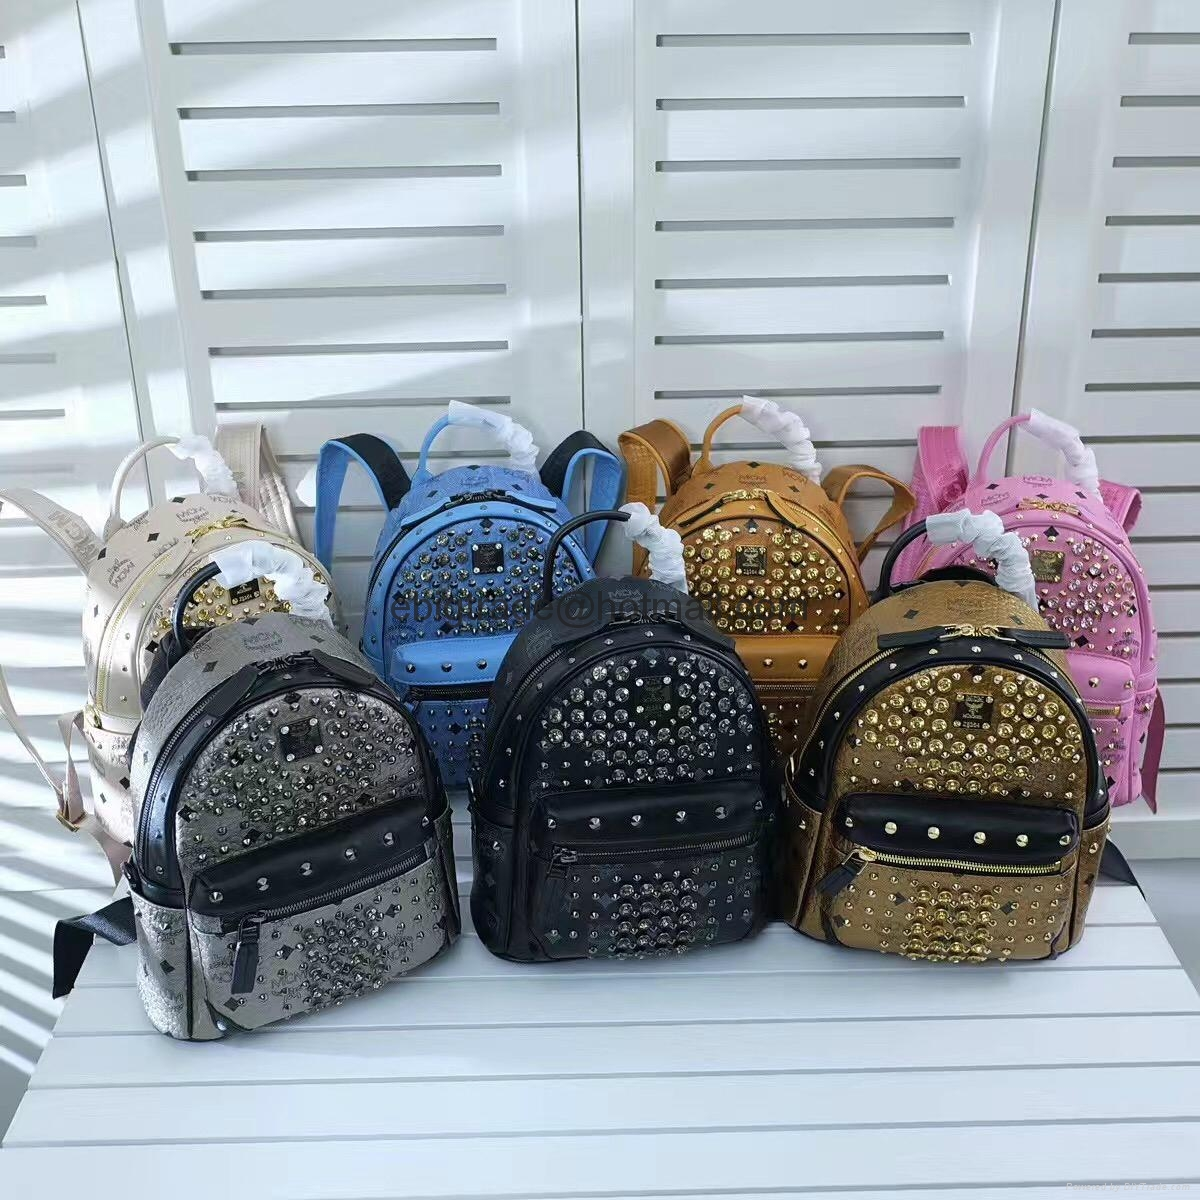 cheap mcm backpack price mcm backpack for men mcm bags on sale mcm bags outlet china trading. Black Bedroom Furniture Sets. Home Design Ideas